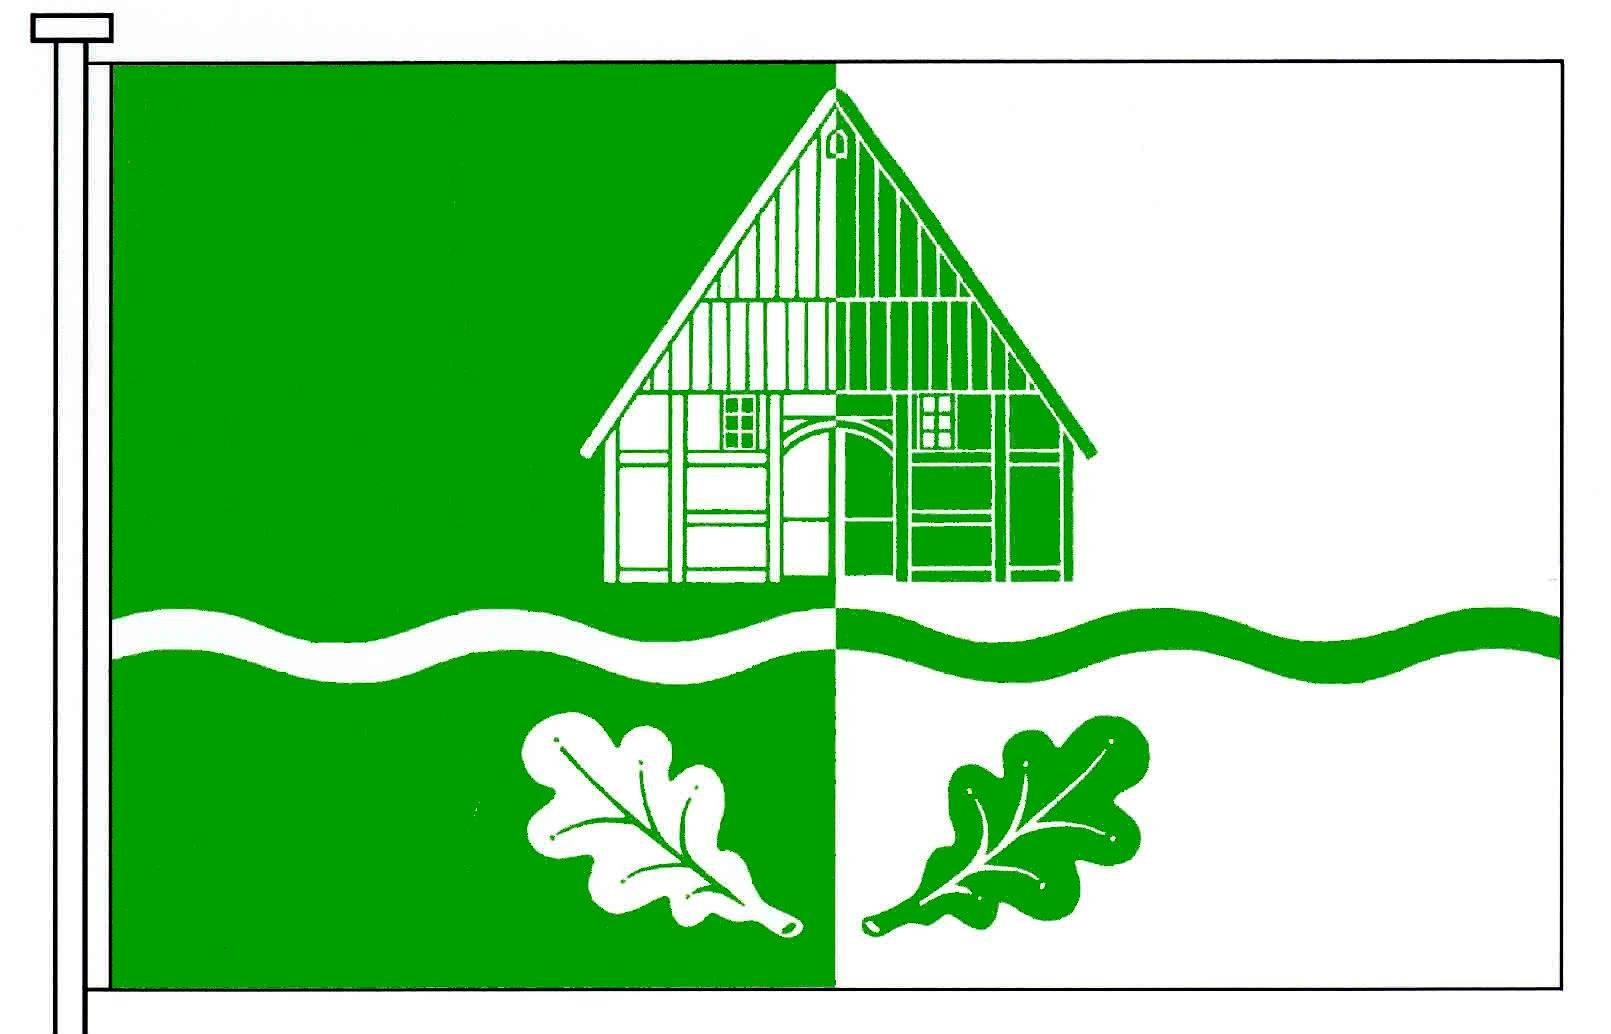 Flagge GemeindeArpsdorf, Kreis Rendsburg-Eckernförde